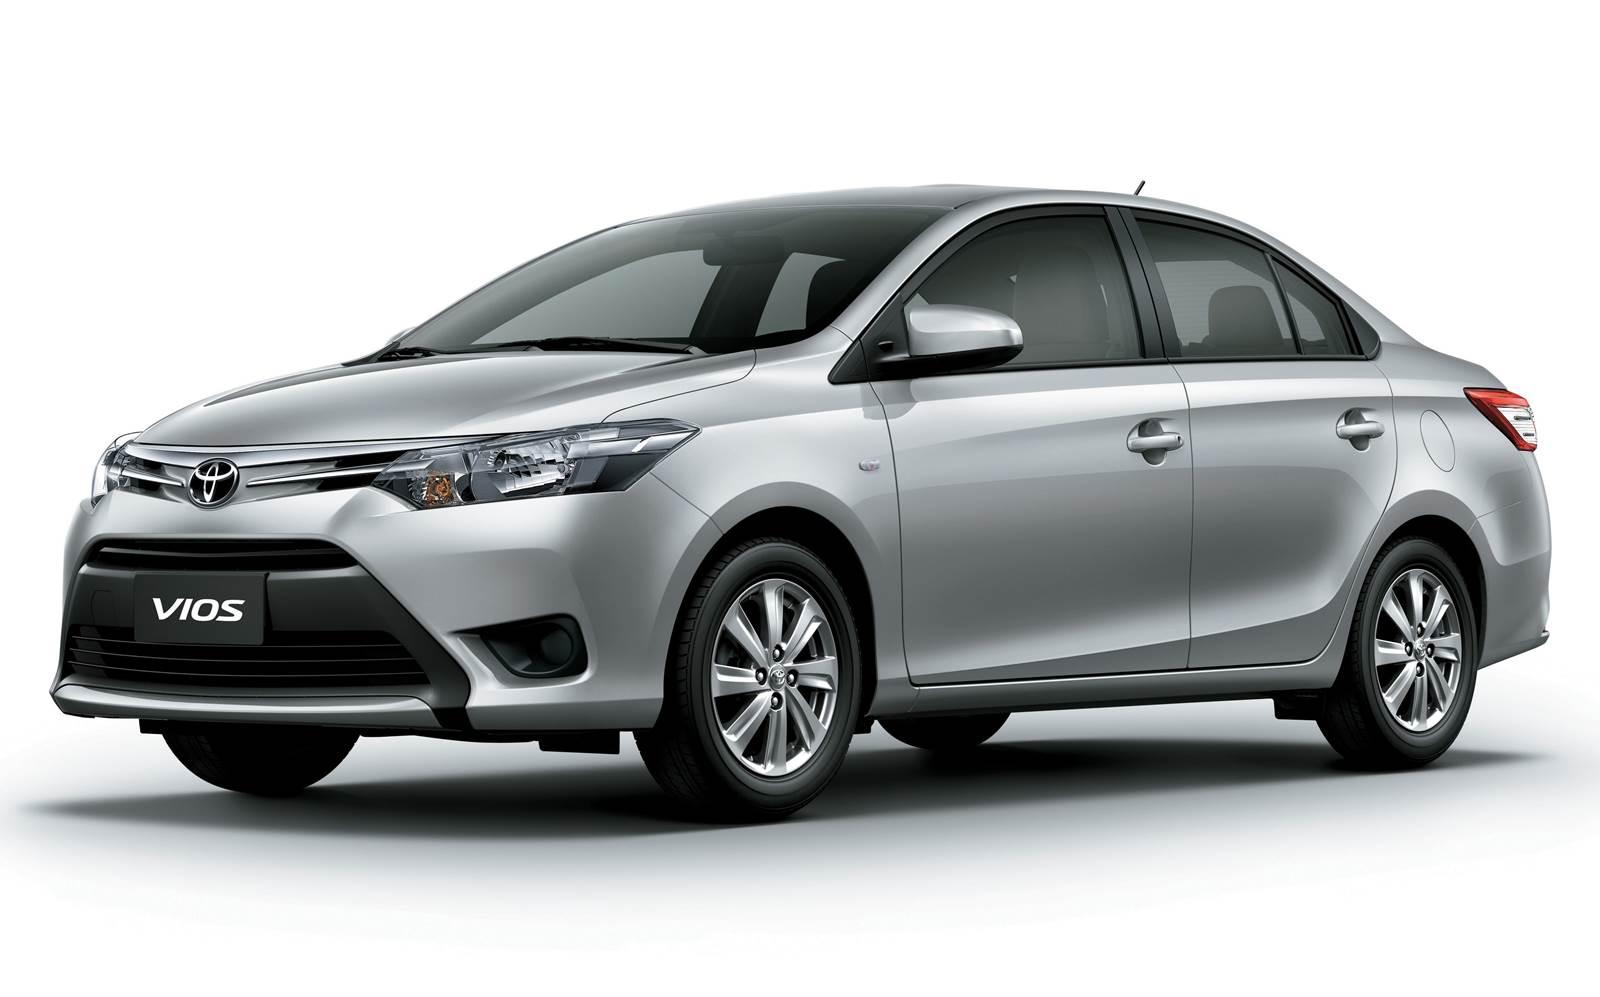 2015 Toyota Vios